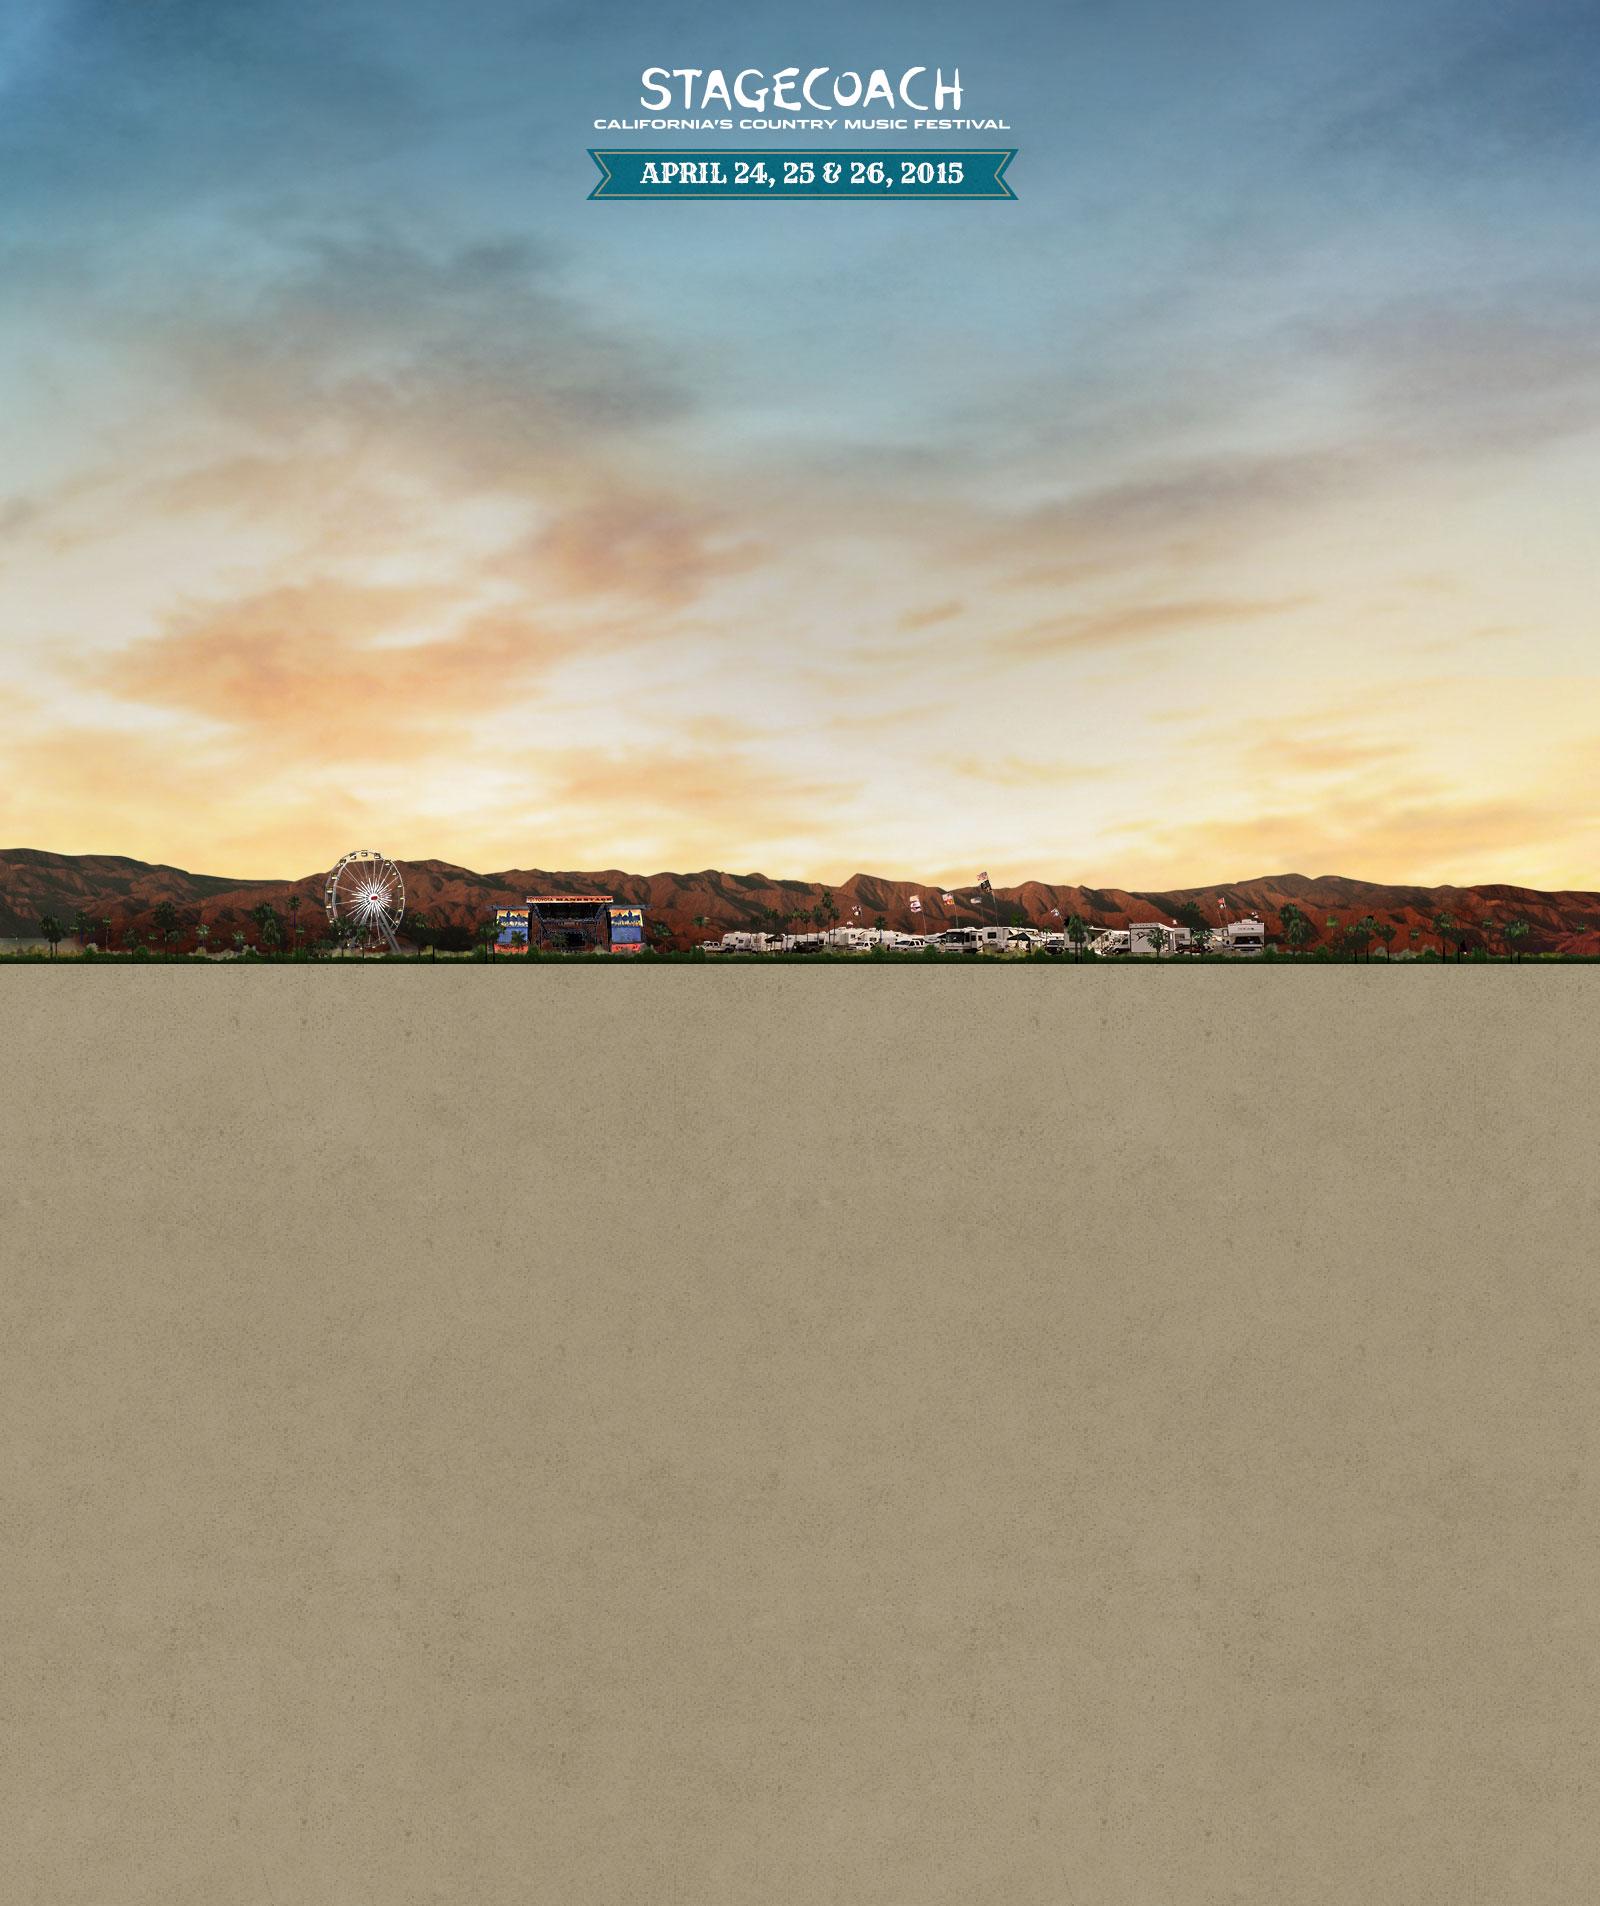 Stagecoach 2015